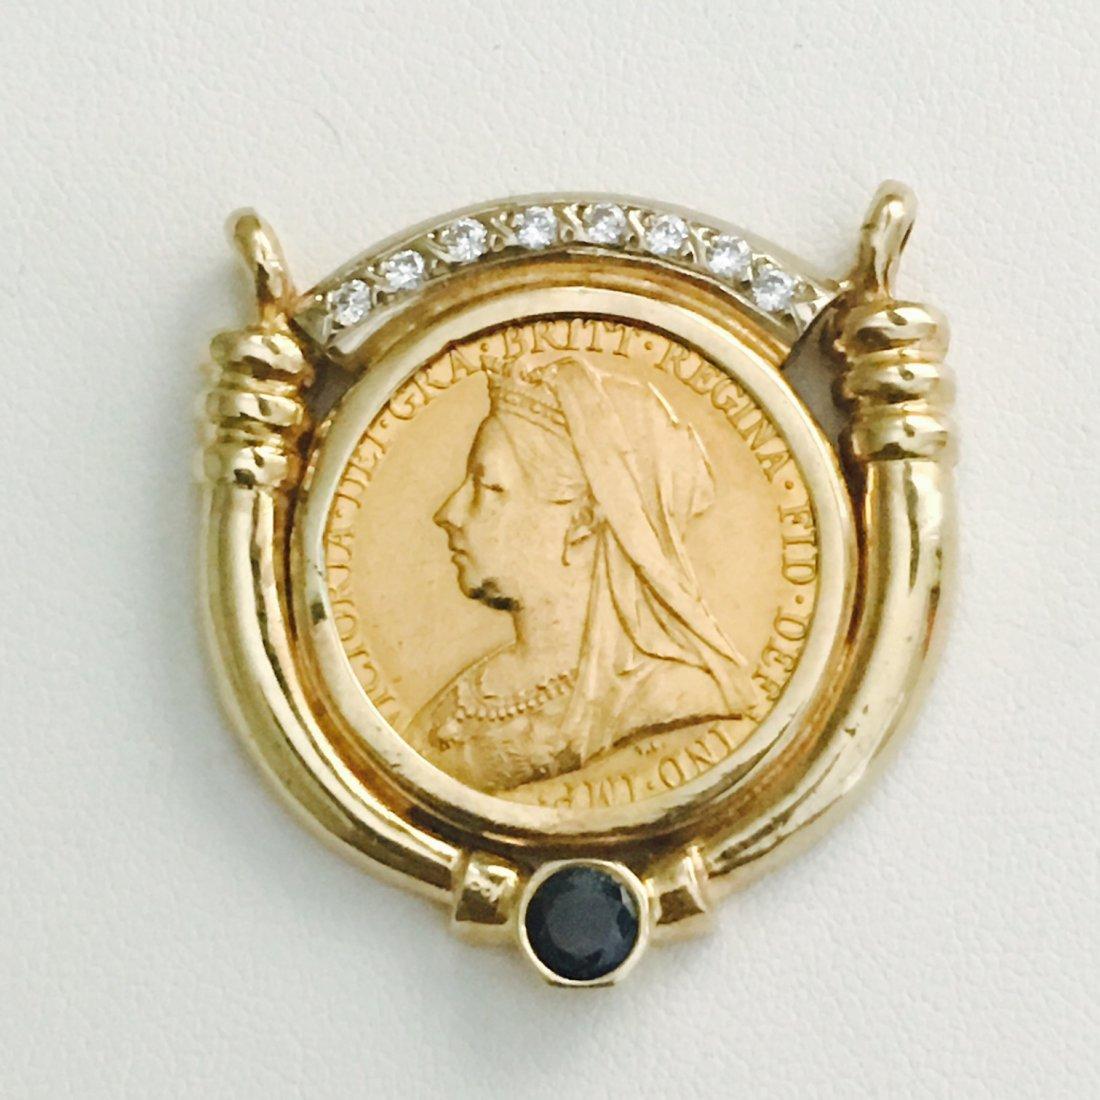 1899 QUEEN VICTORIA GOLD COIN W/ DIAMOND  BLUE SAPPHIRE - 3